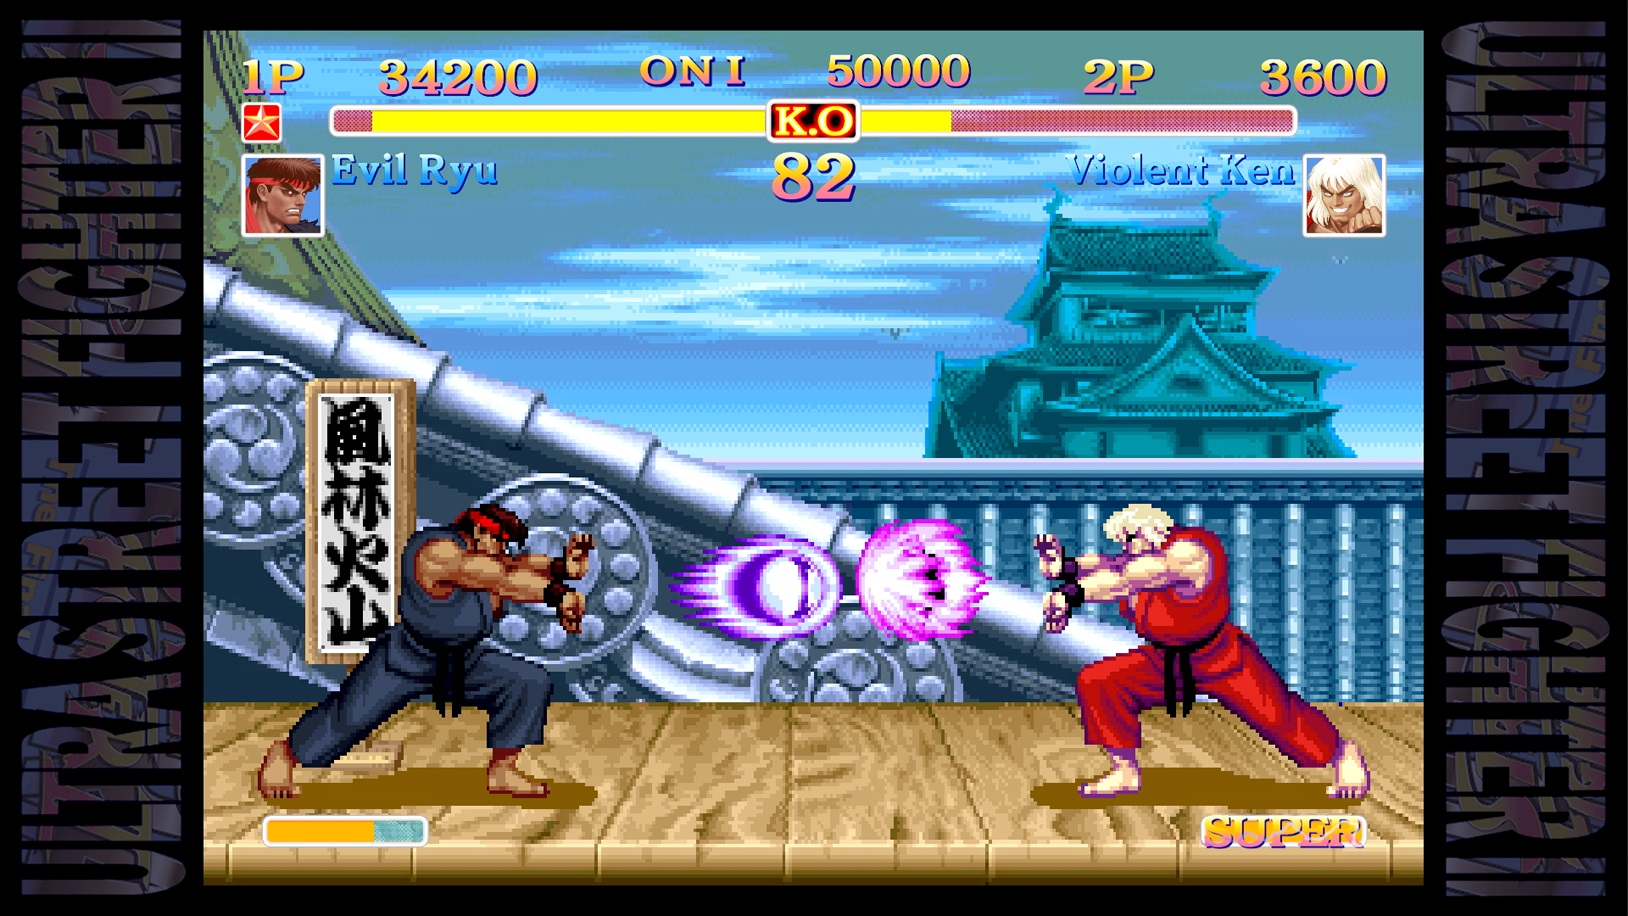 Ultra Street Fighter II fireballs